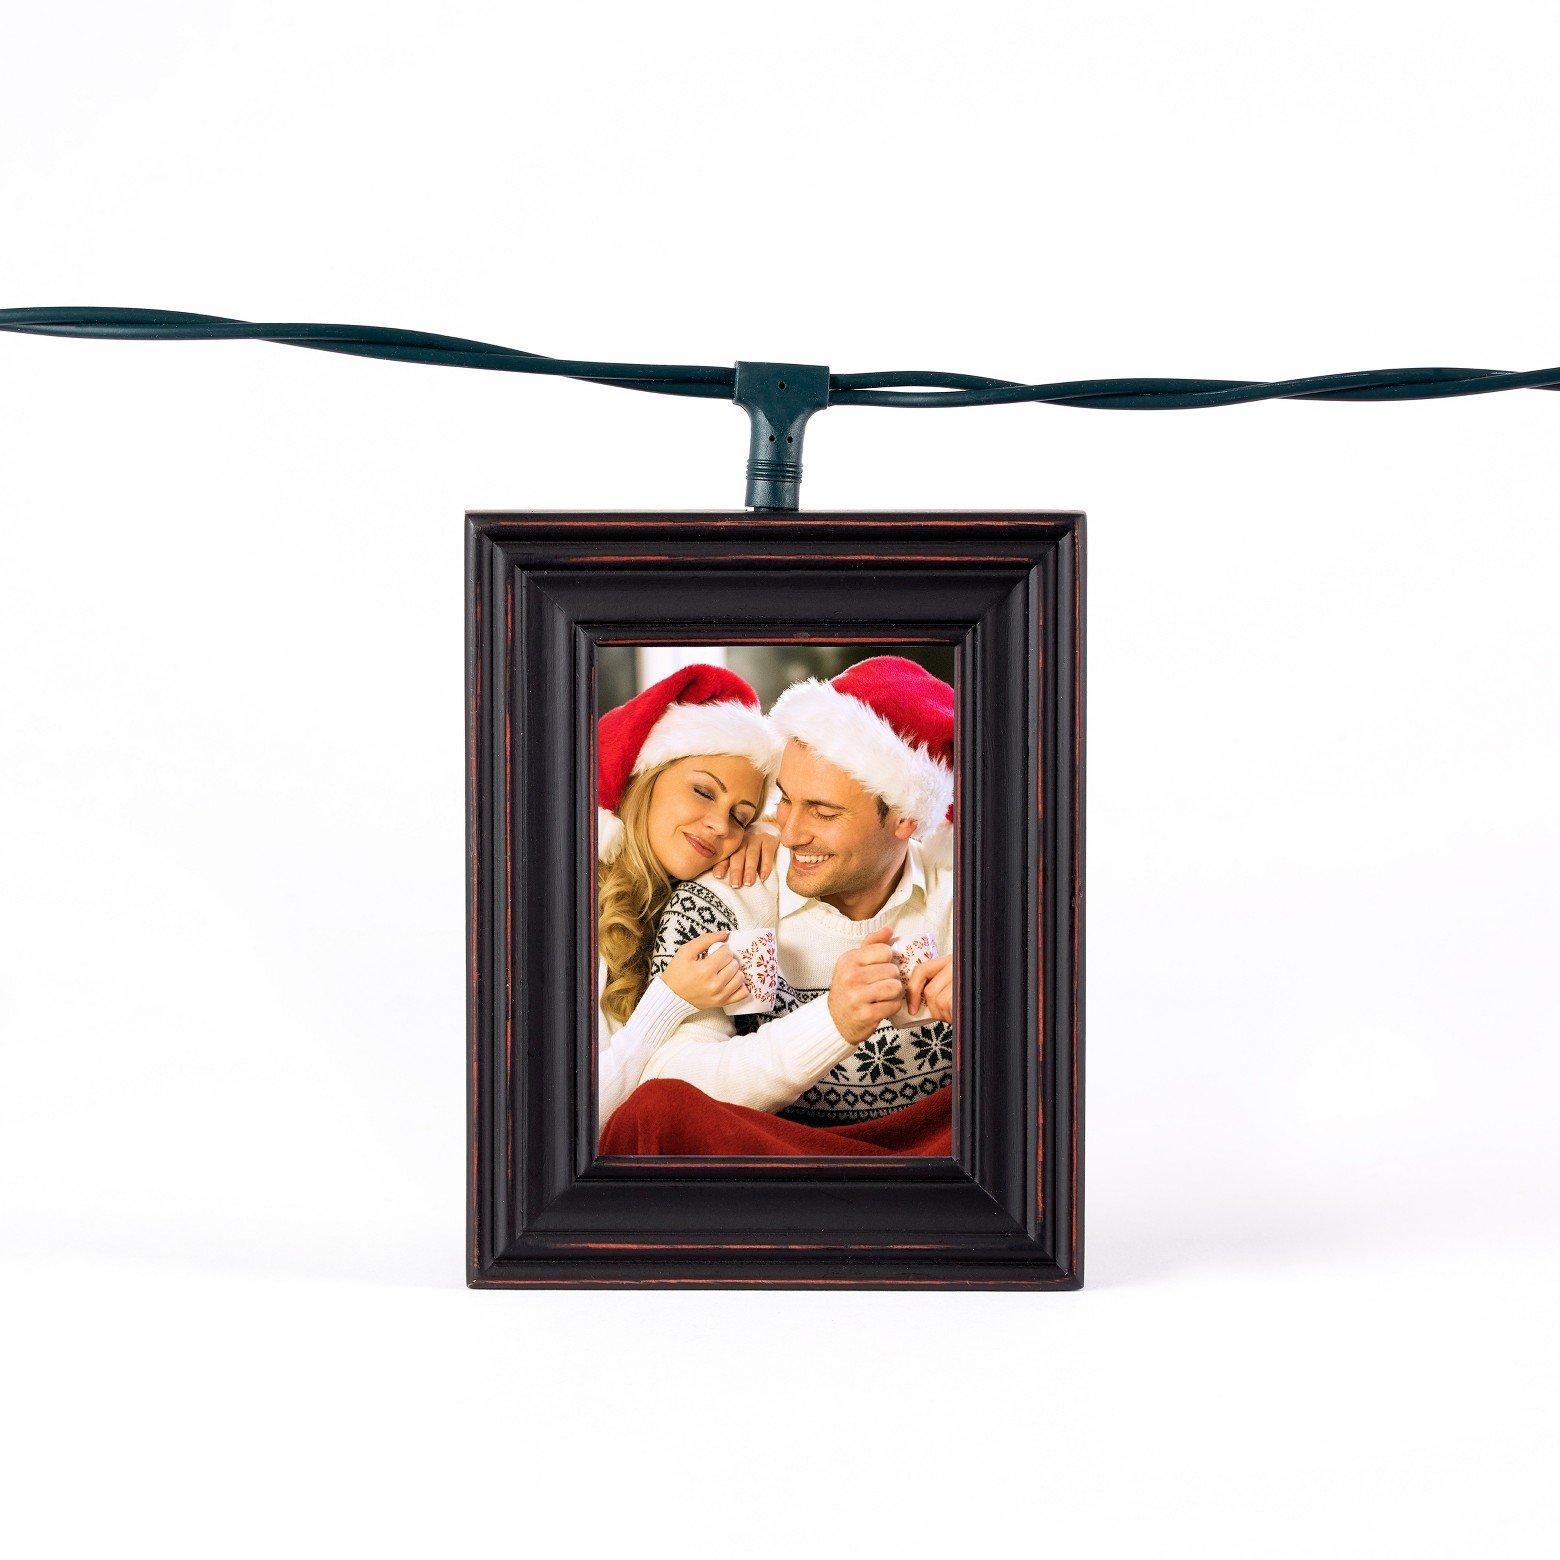 Polaroid 5 Photo Frame Lightboxes - Distressed Black Wood Frame